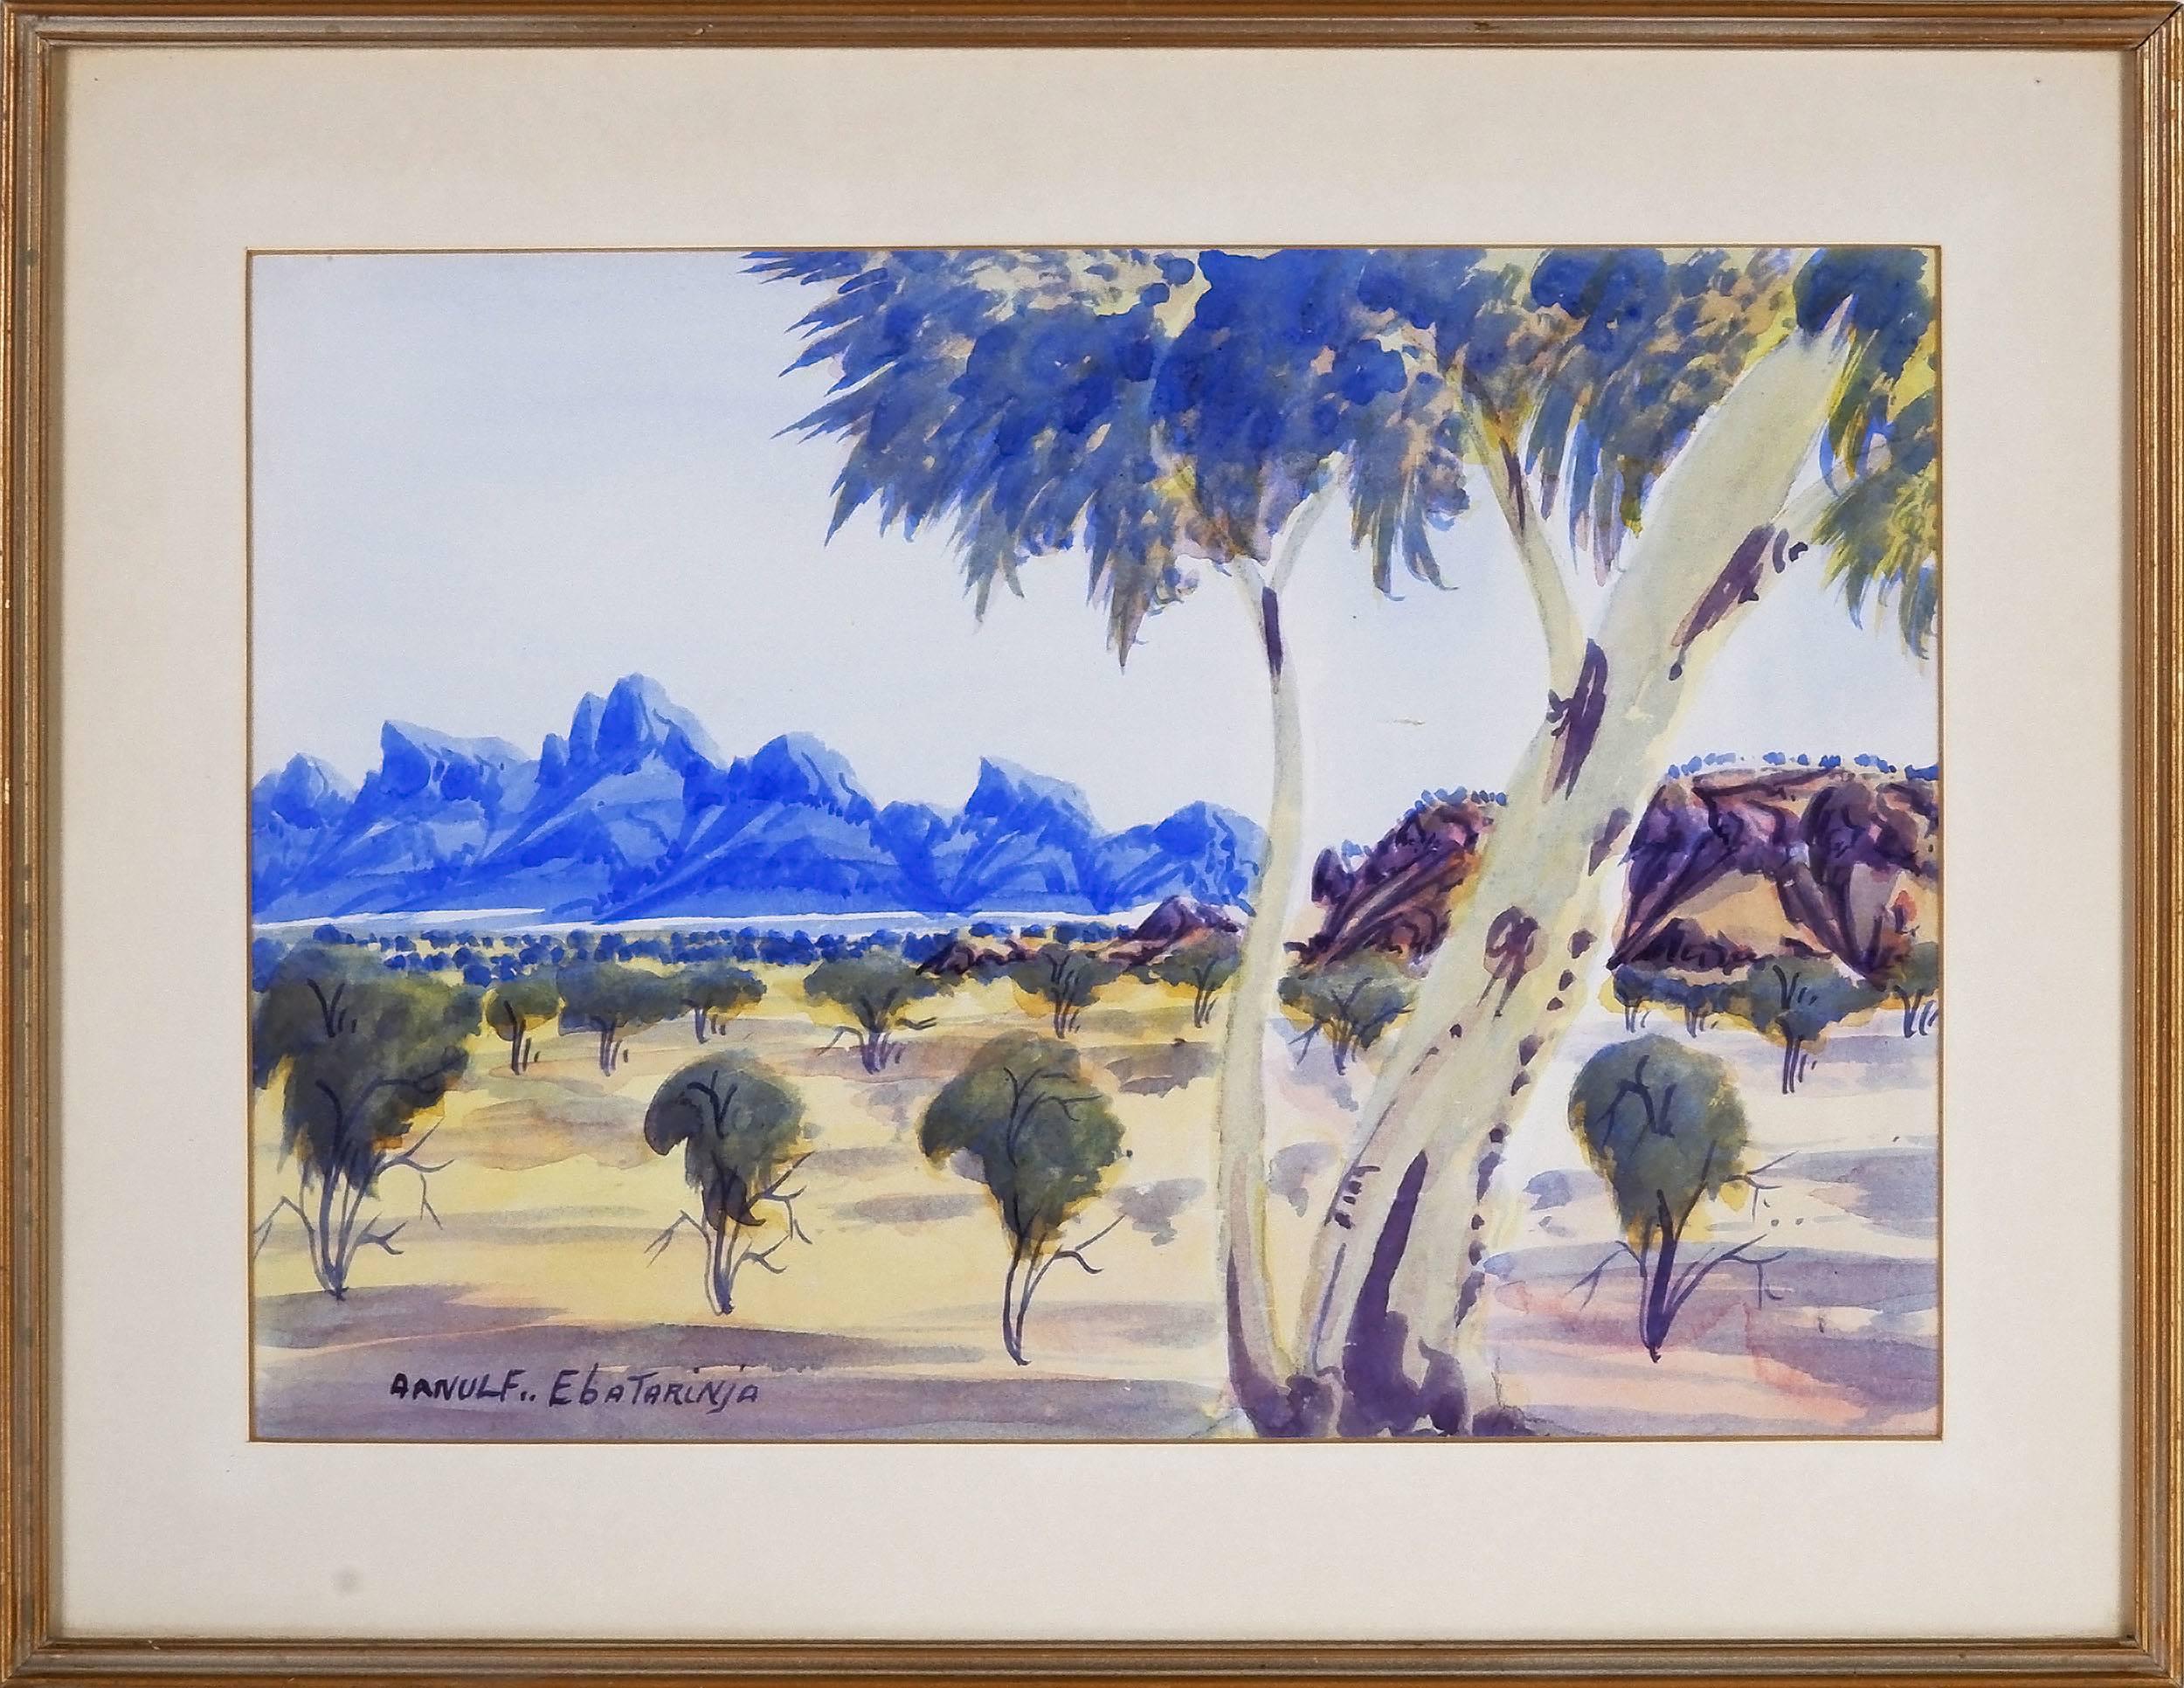 'Arnulf Ebatarinja (Aboriginal 1931 -) Haasts Bluff, Watercolour'